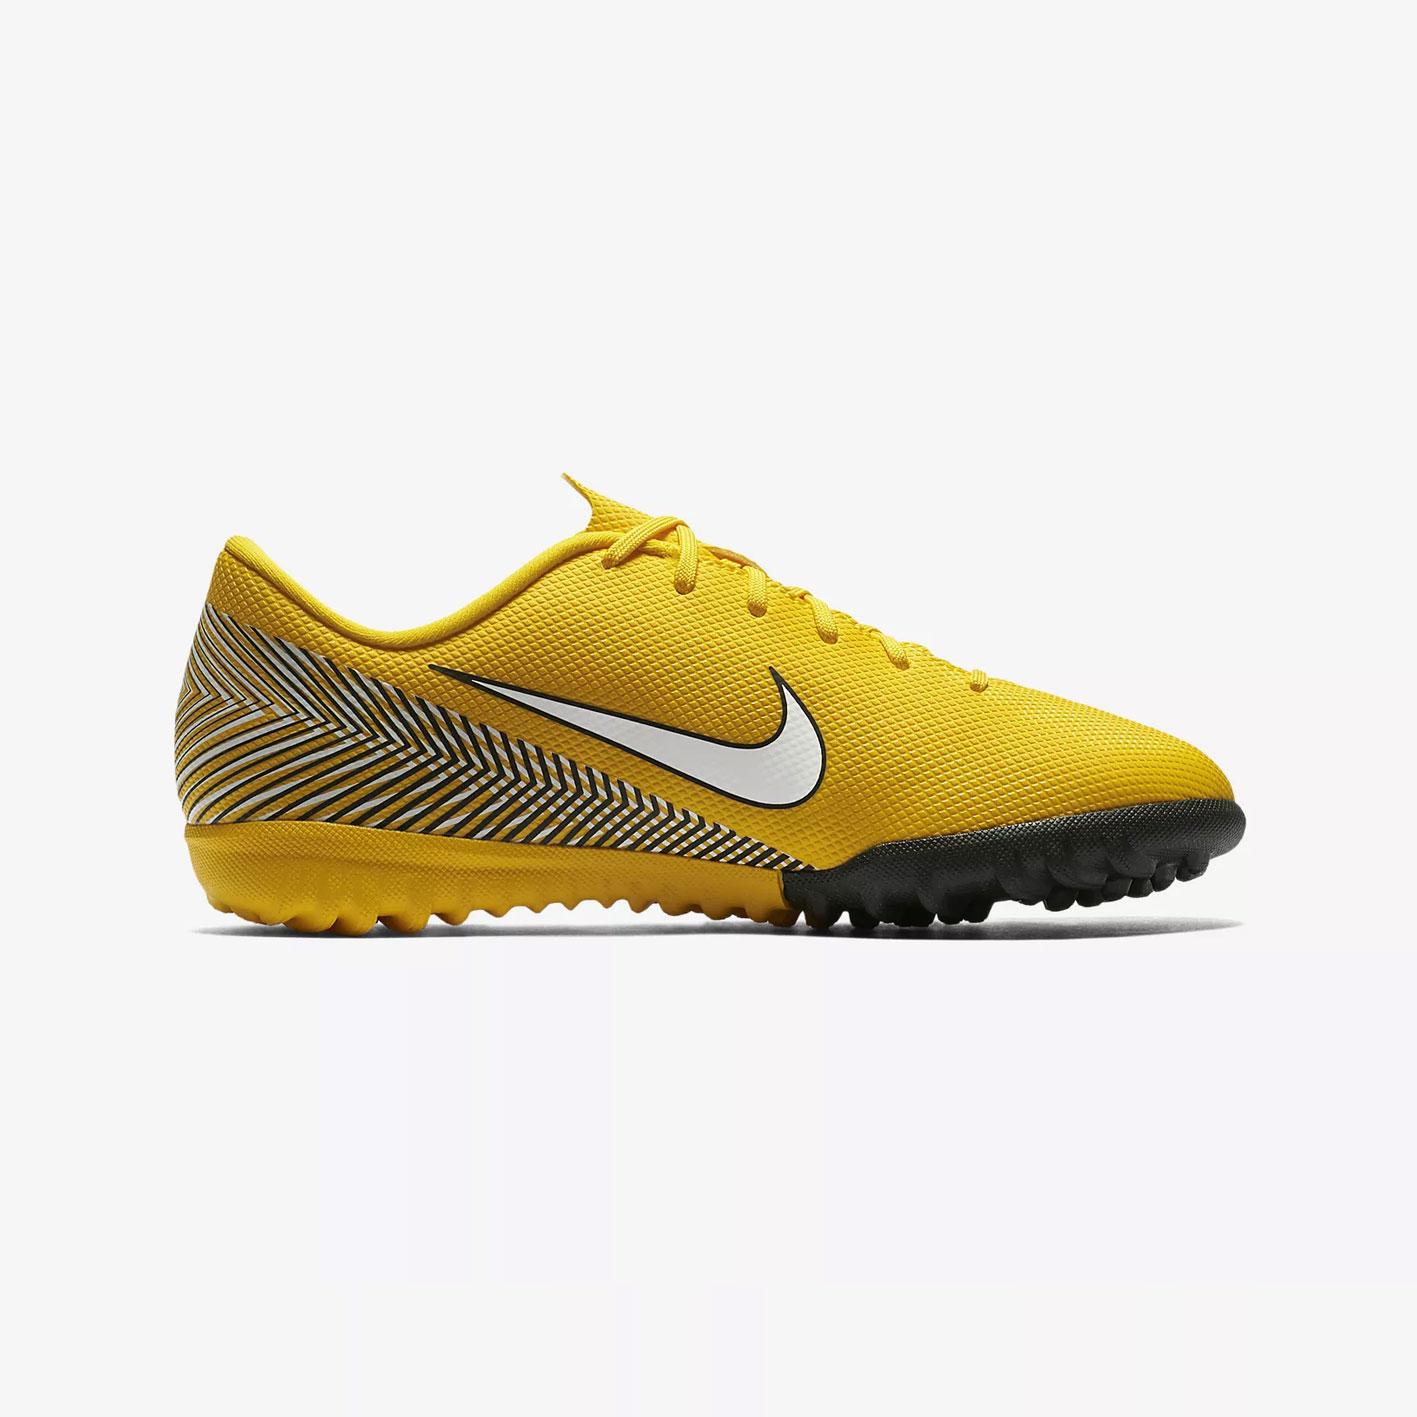 55be267ae Nike Kids Mercurial Vapor XII Academy Neymar Turf Football Boots Amarillo